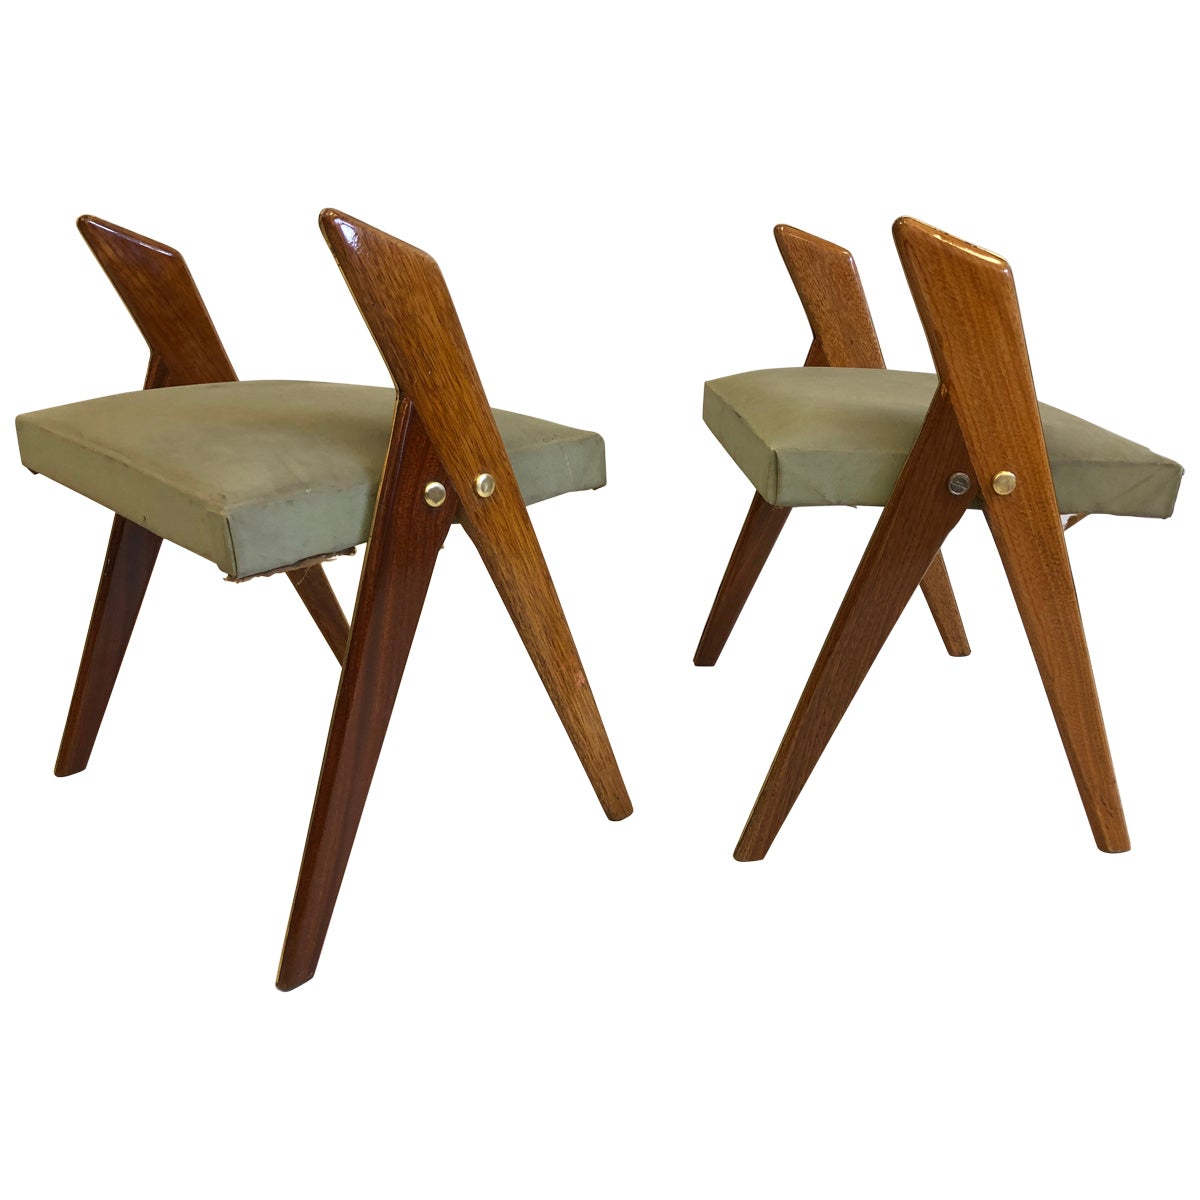 Pair of Italian Mid-Century Modern Benches or Stools, Osvaldo Borsani Attributed